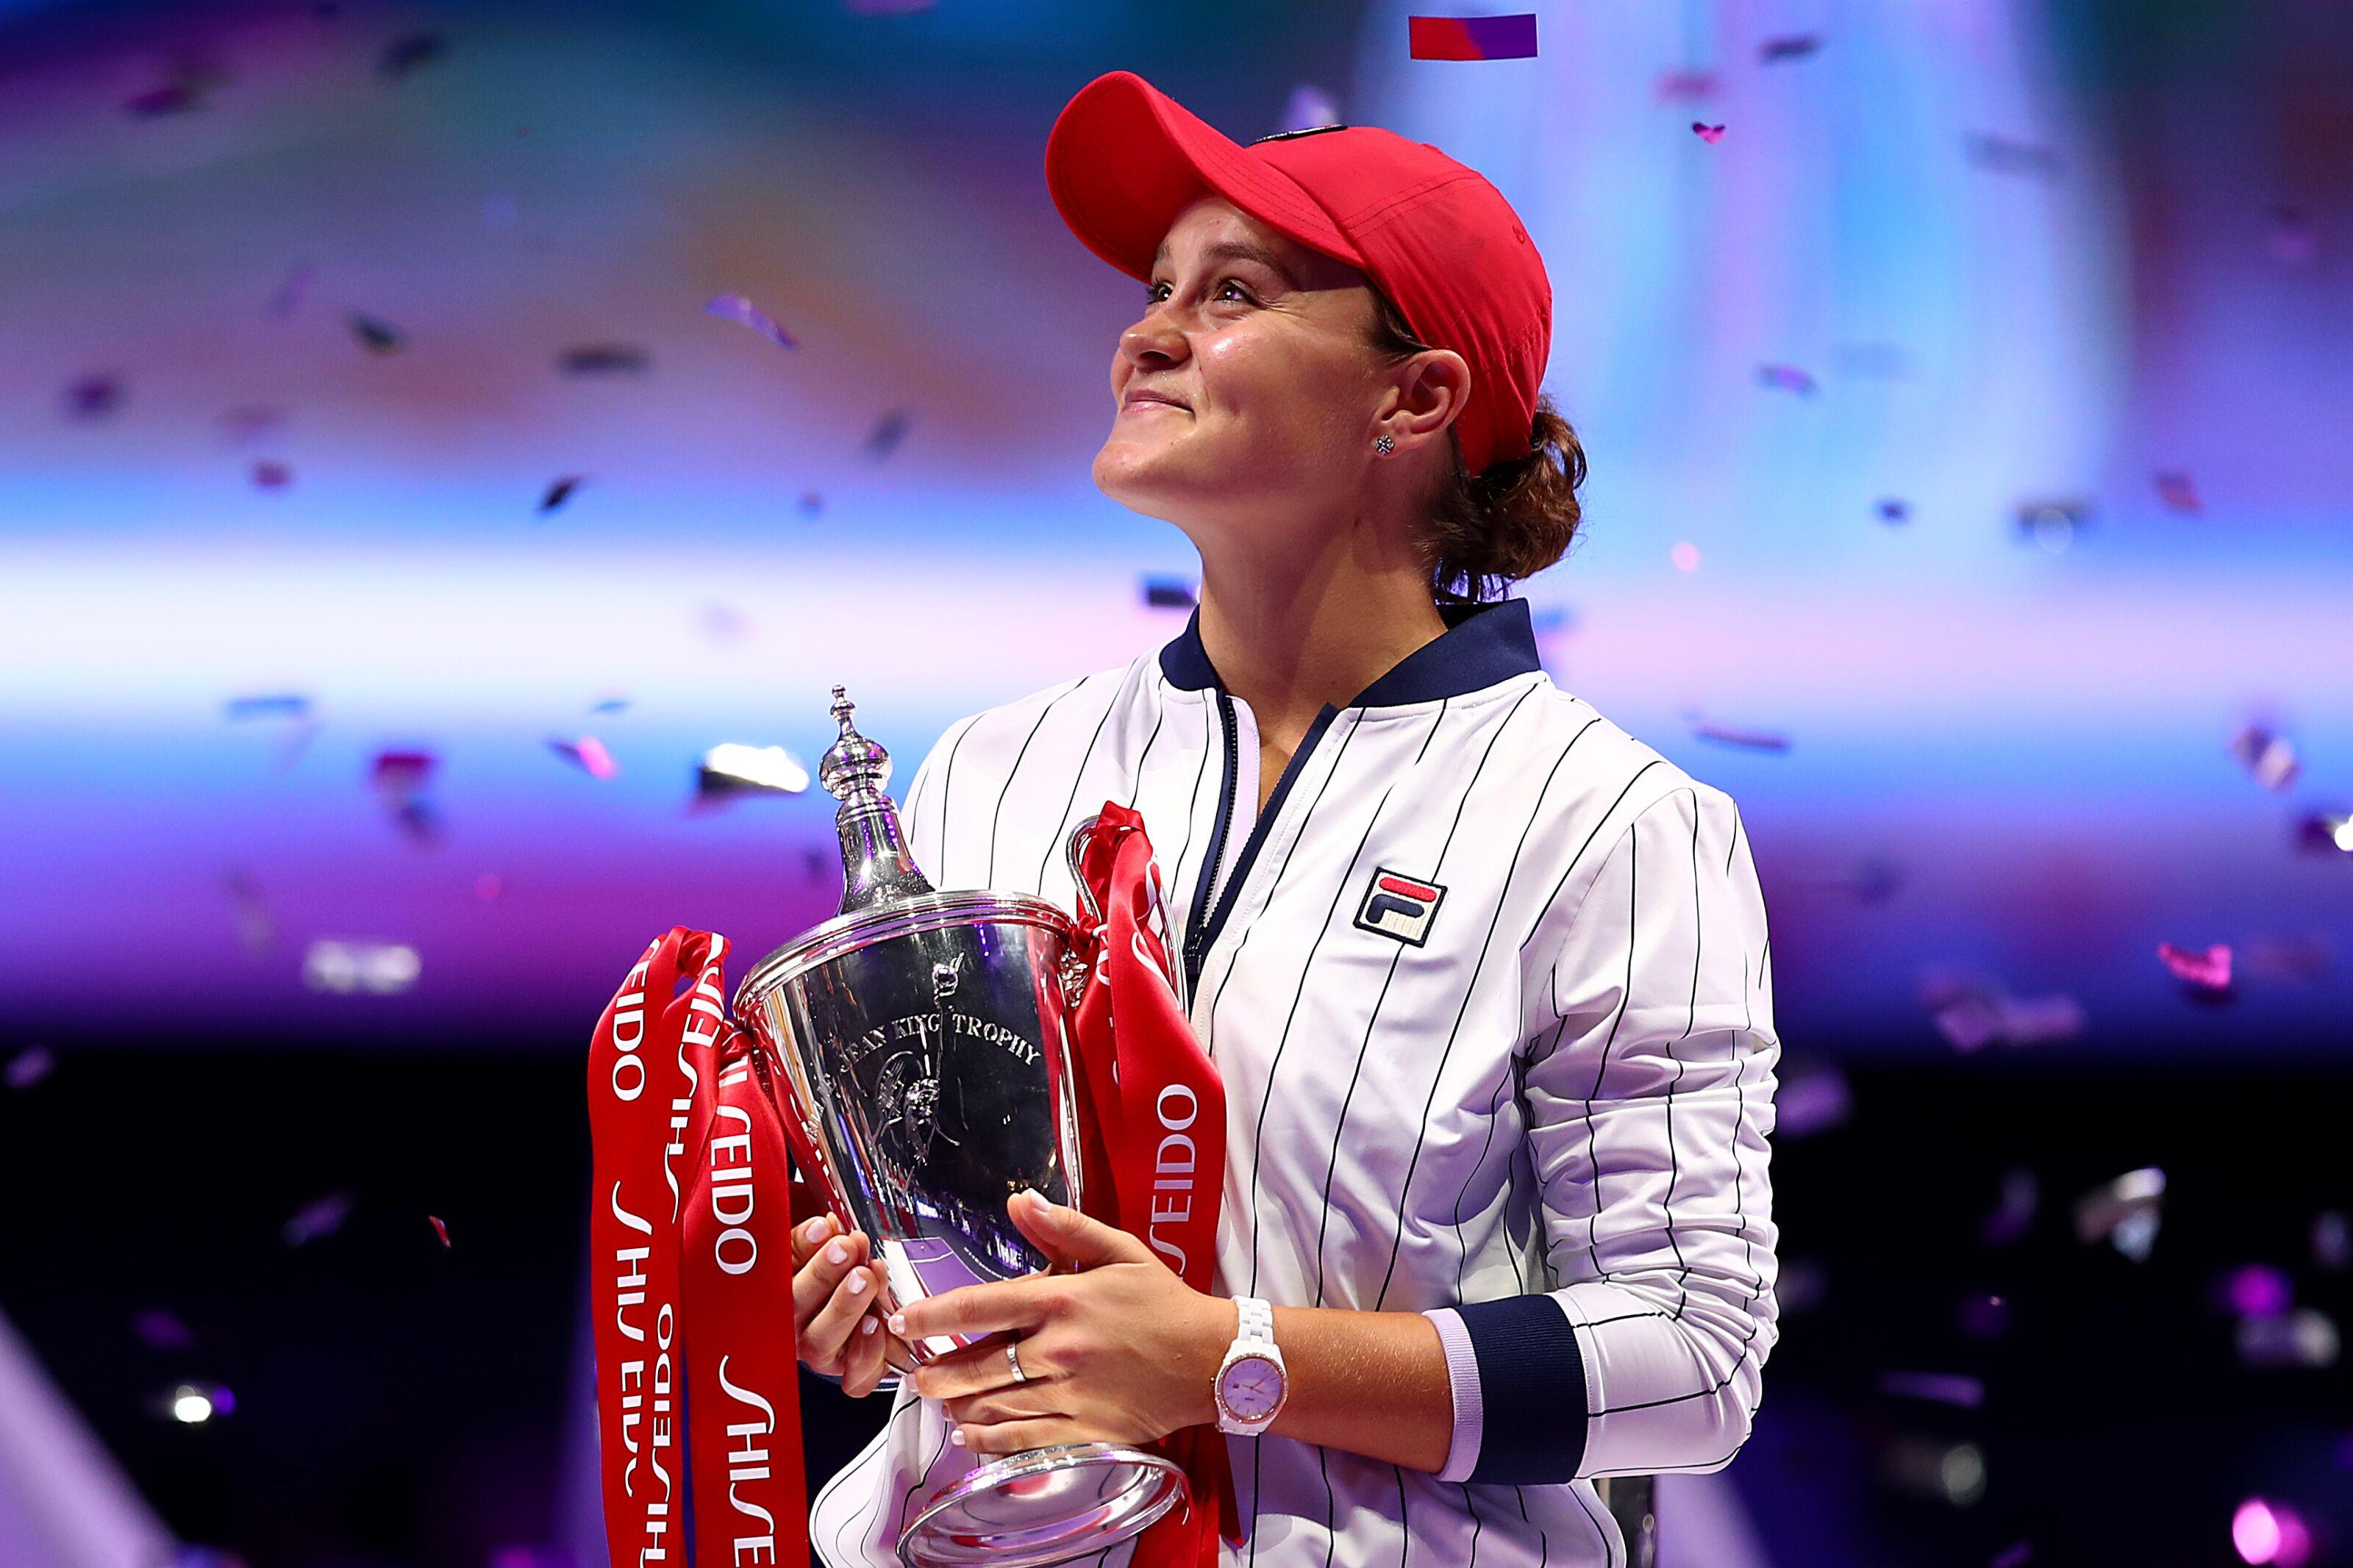 WTA Player of the Year: Ashleigh Barty beats Naomi Osaka to top honour